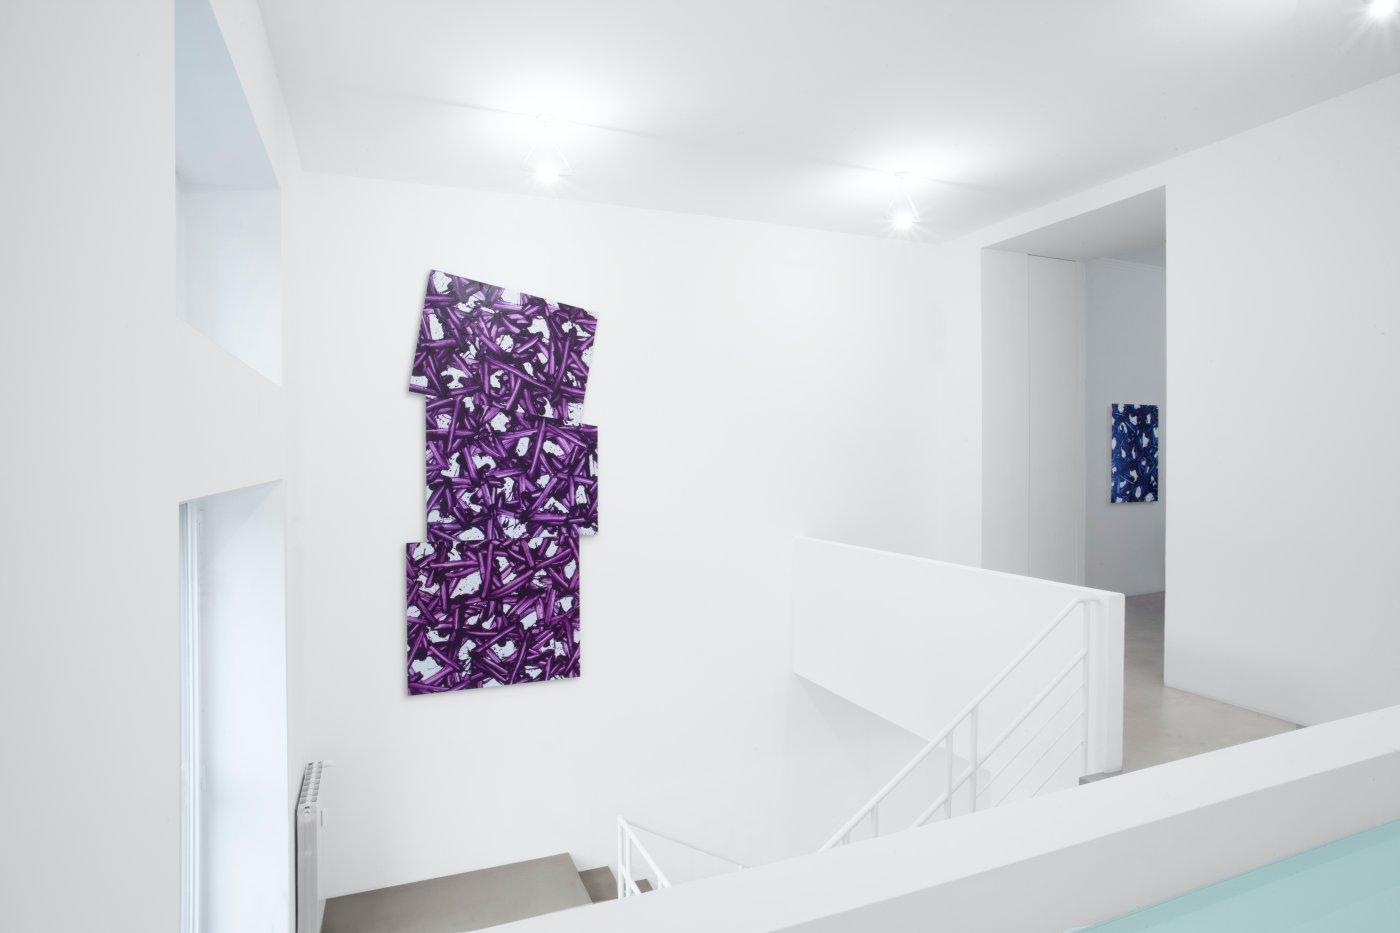 A Arte Invernizzi Gianni Asdrubali 7